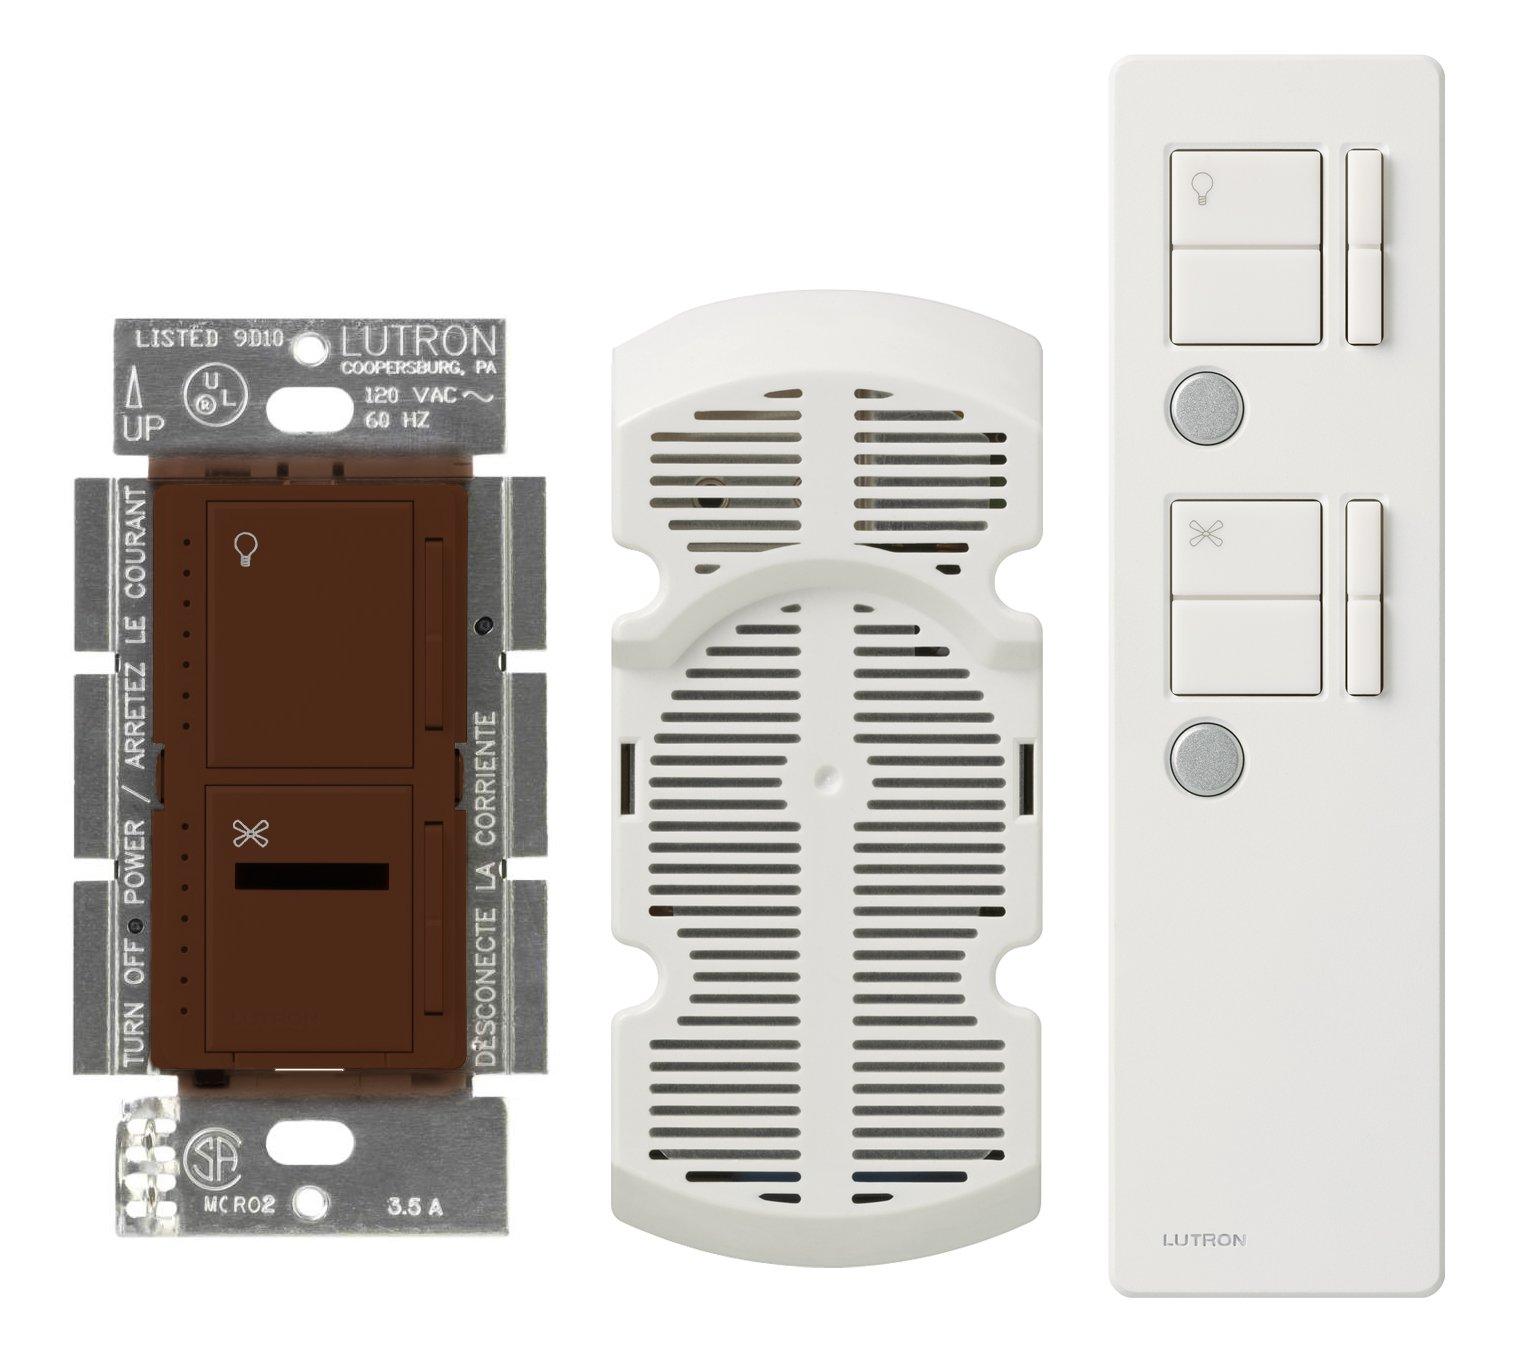 Lutron MIR-LFQMT-SI Maestro Ir 300-Watt Multi-Location Digital Dimmer 1-Amp Quiet Fan Control with Remote Control and Canopy Module, Sienna by Lutron